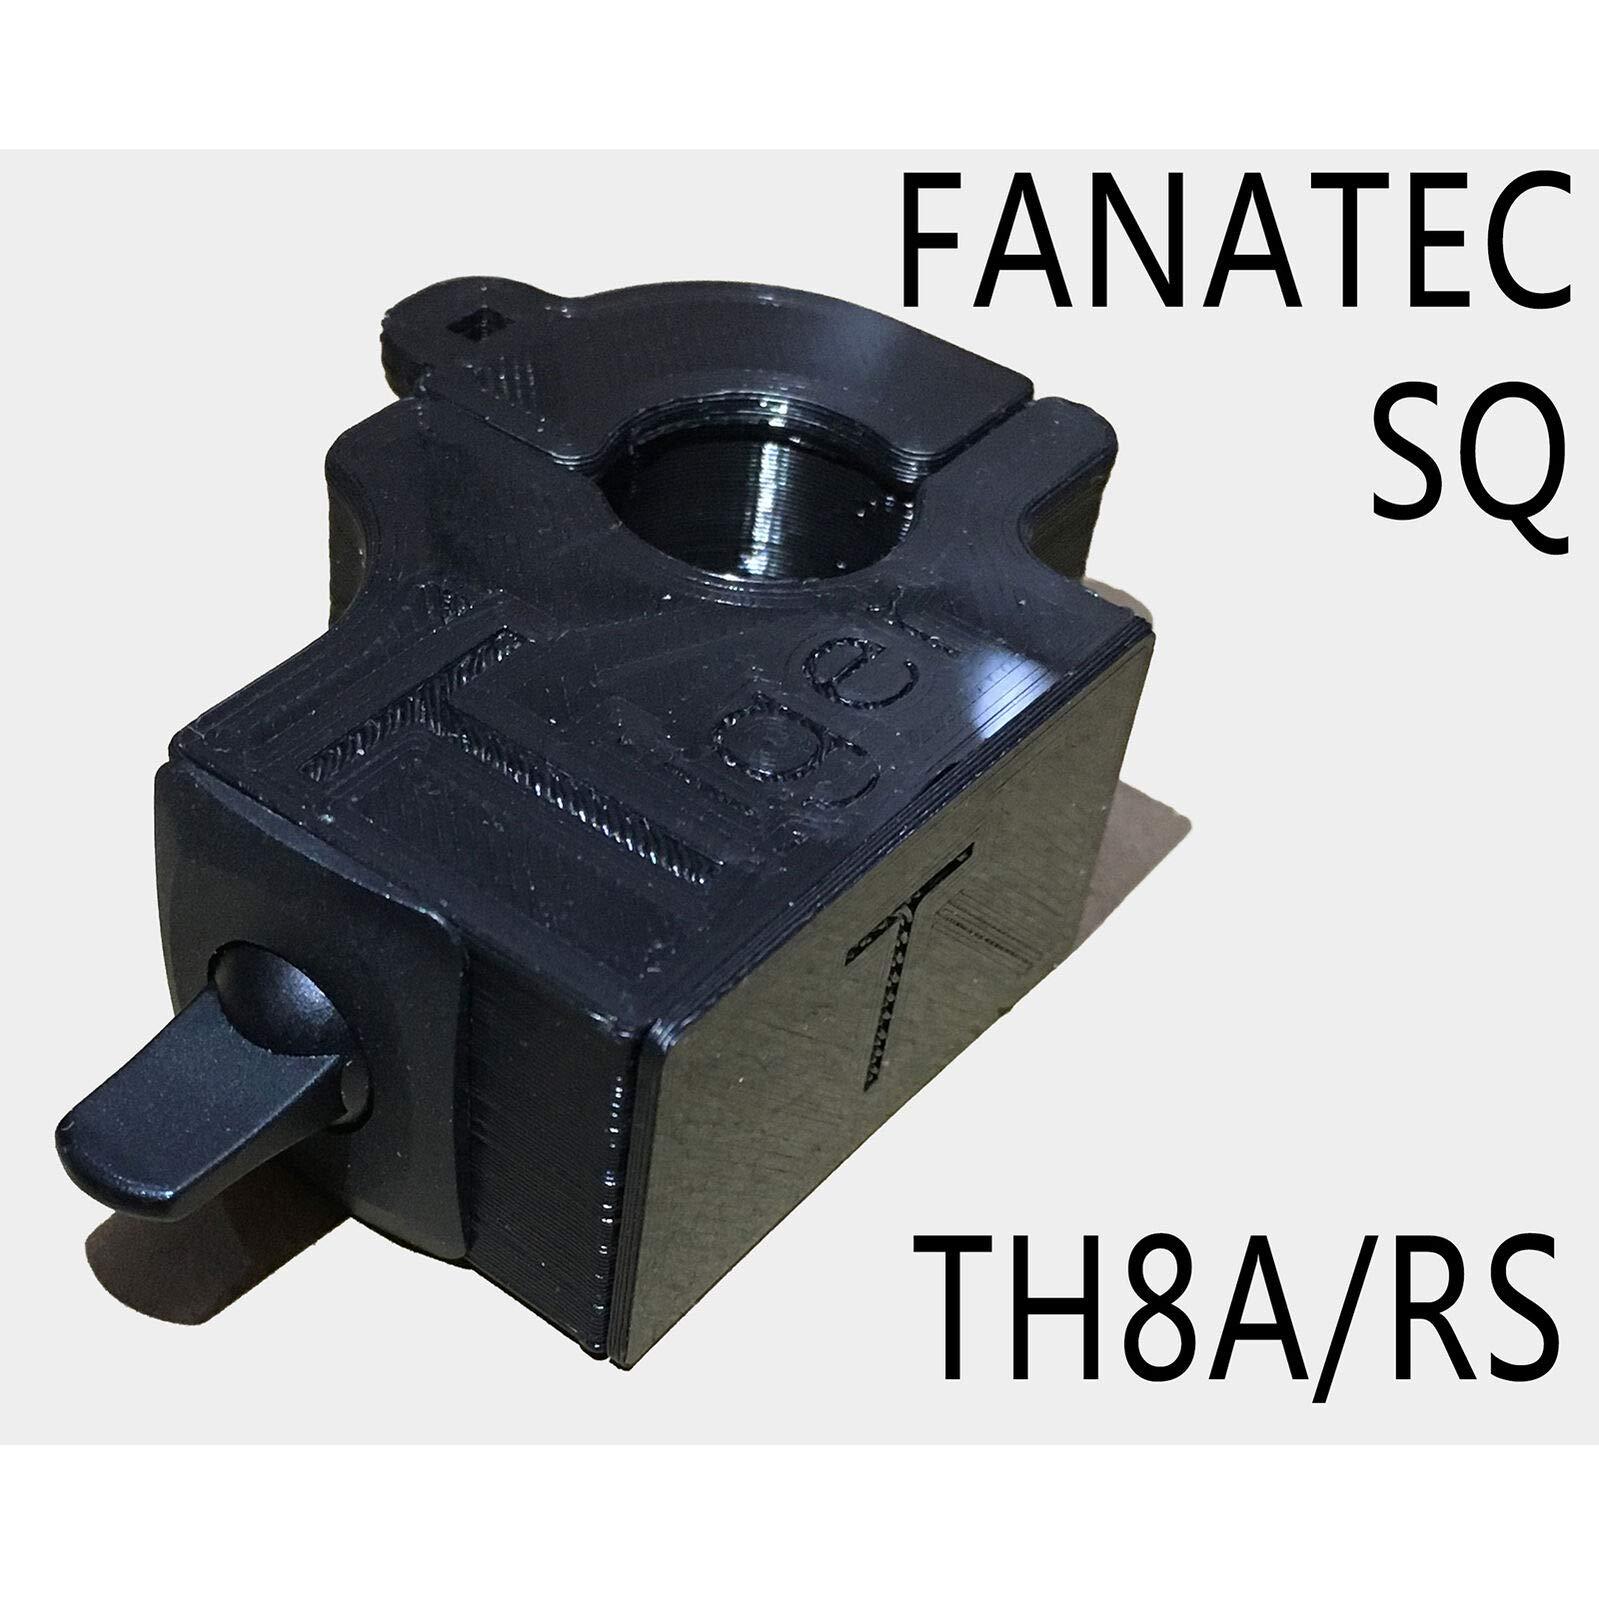 Mini 16 Speed Gearshift Shifter Module Standard Professional for Logitech G25/G27/G29/TH8A/FANATEC